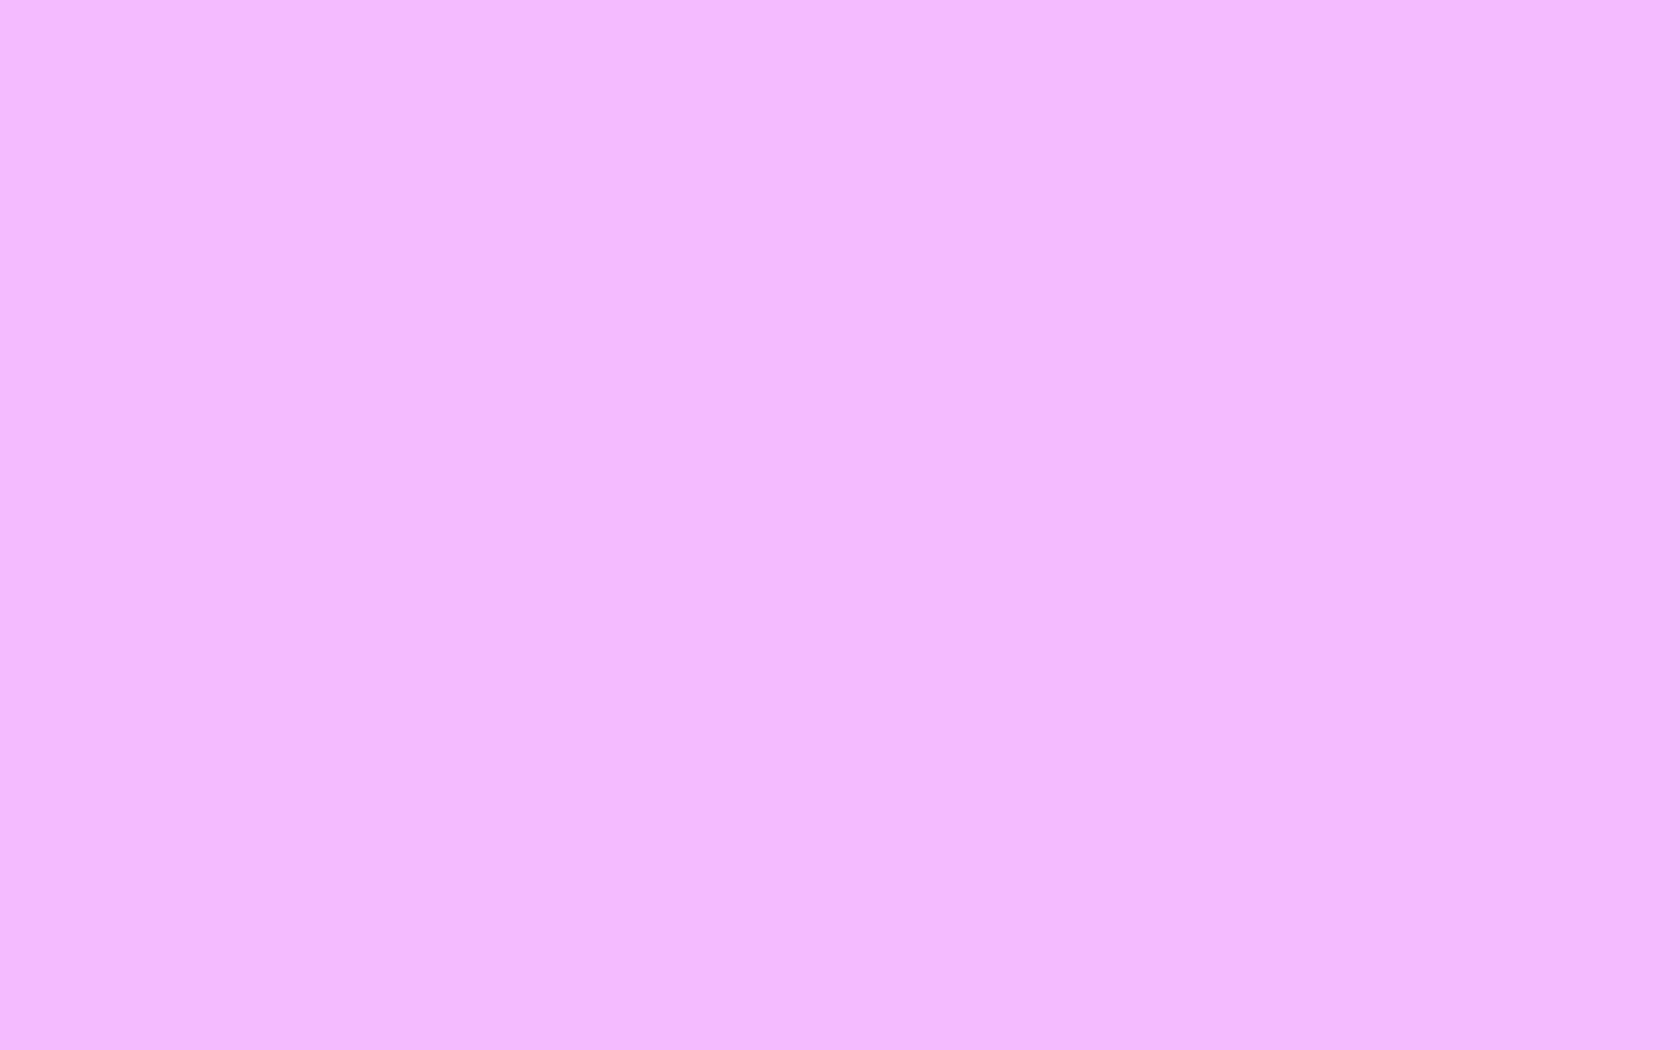 1680x1050 Brilliant Lavender Solid Color Background